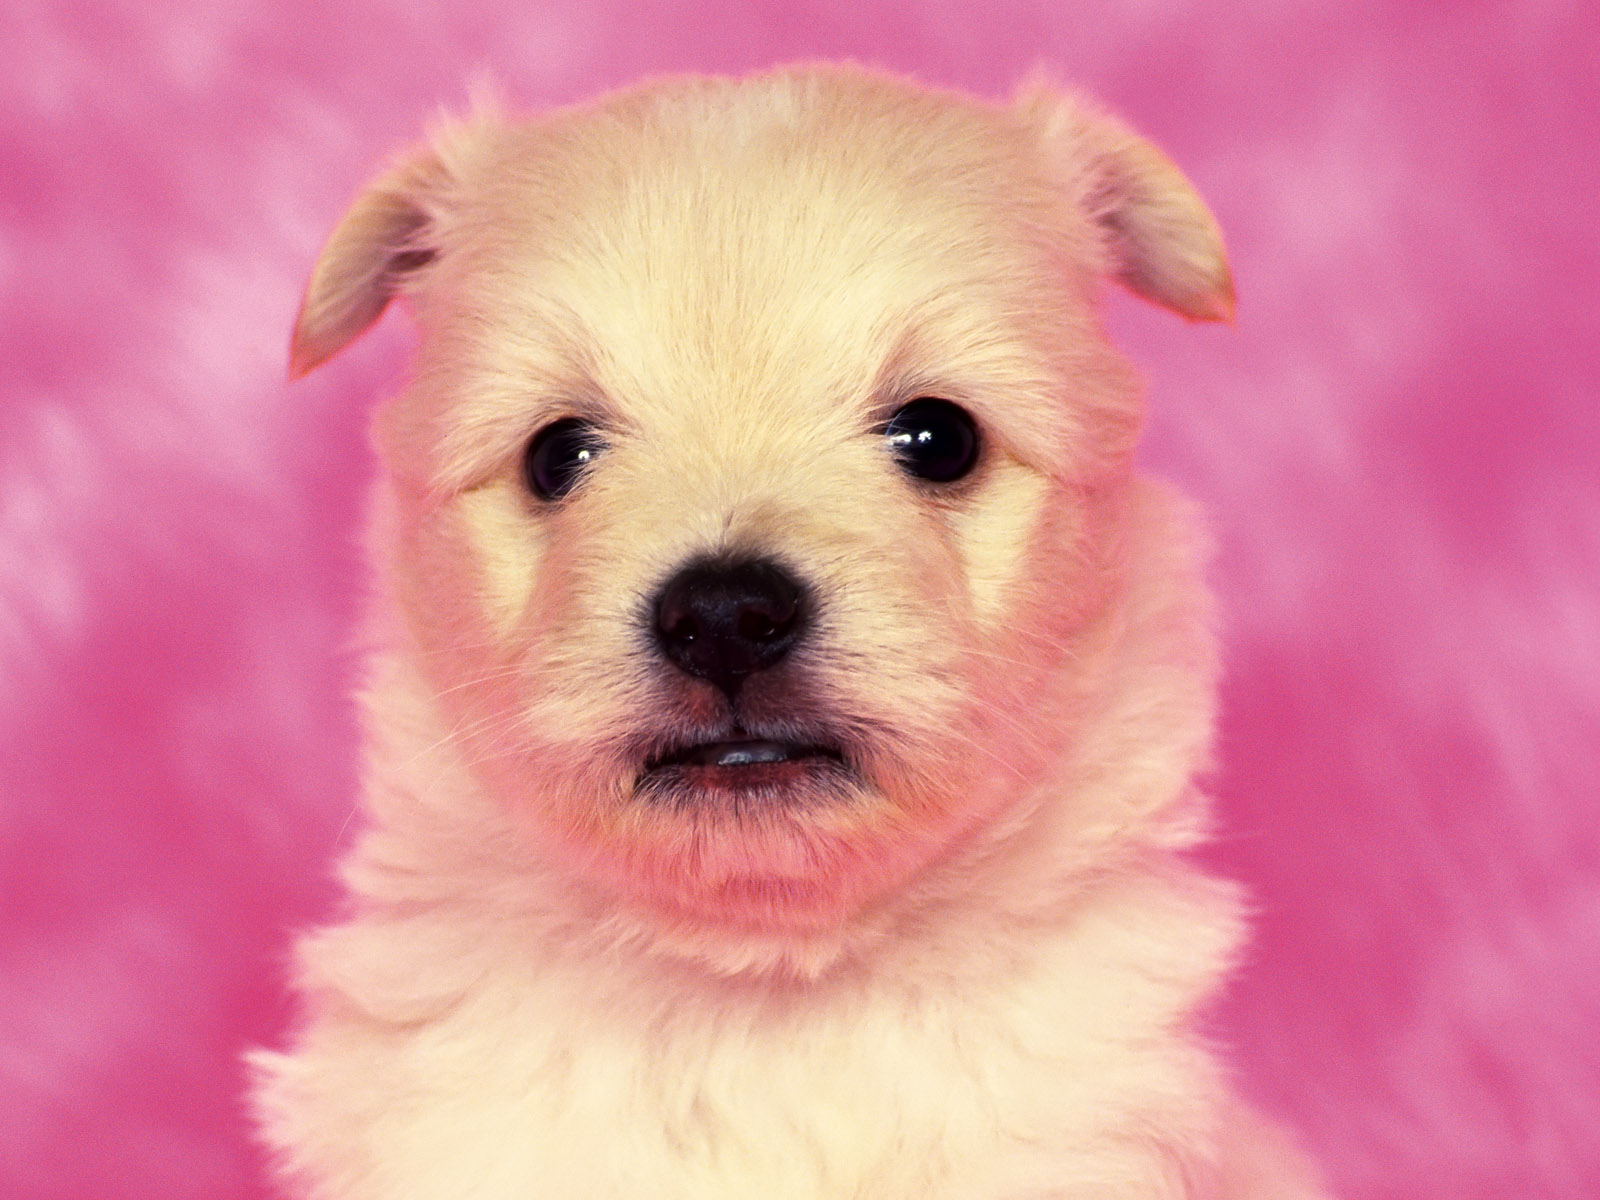 Cute Puppy Dog Wallpaper Wallpaper ME 1600x1200